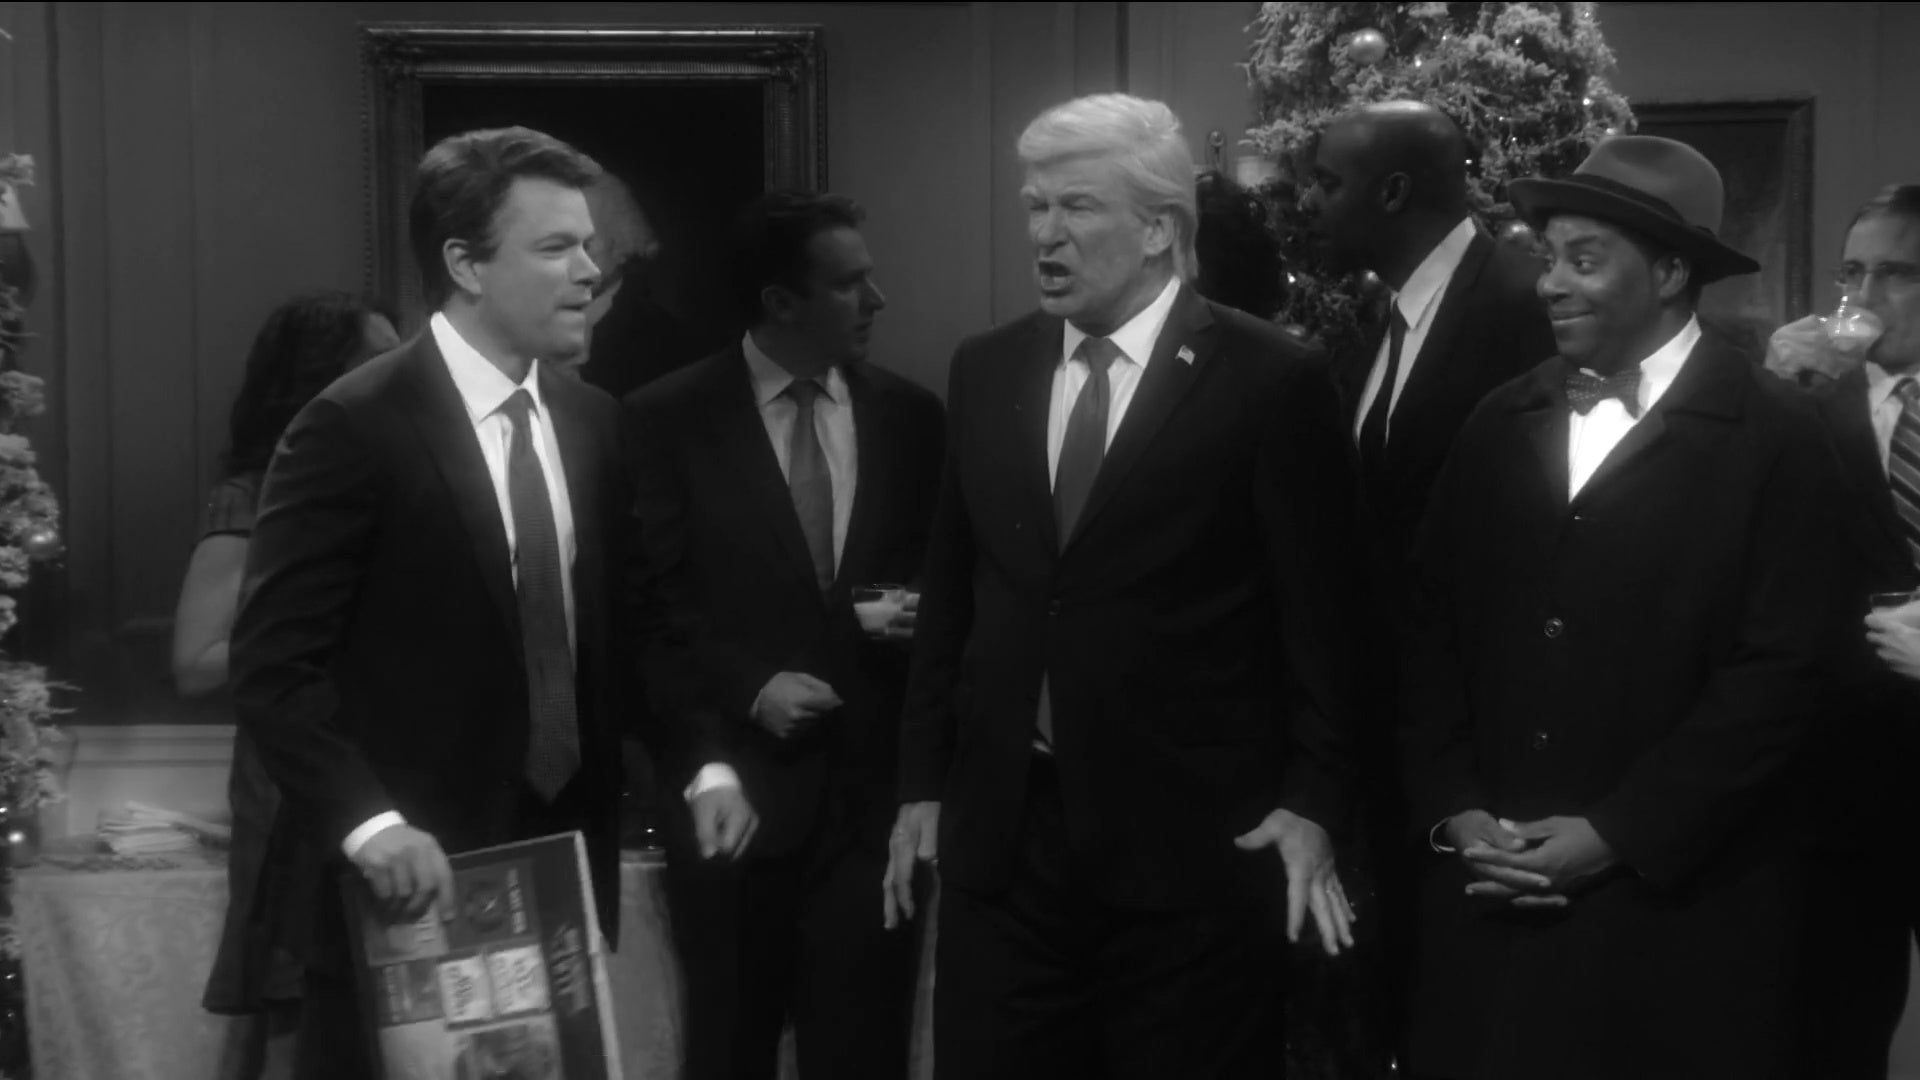 Matt Damon as Brett Kavanaugh, Alec Baldwin as Donald Trump, and Kenan Thompson as Clarence on Saturday Night Live.